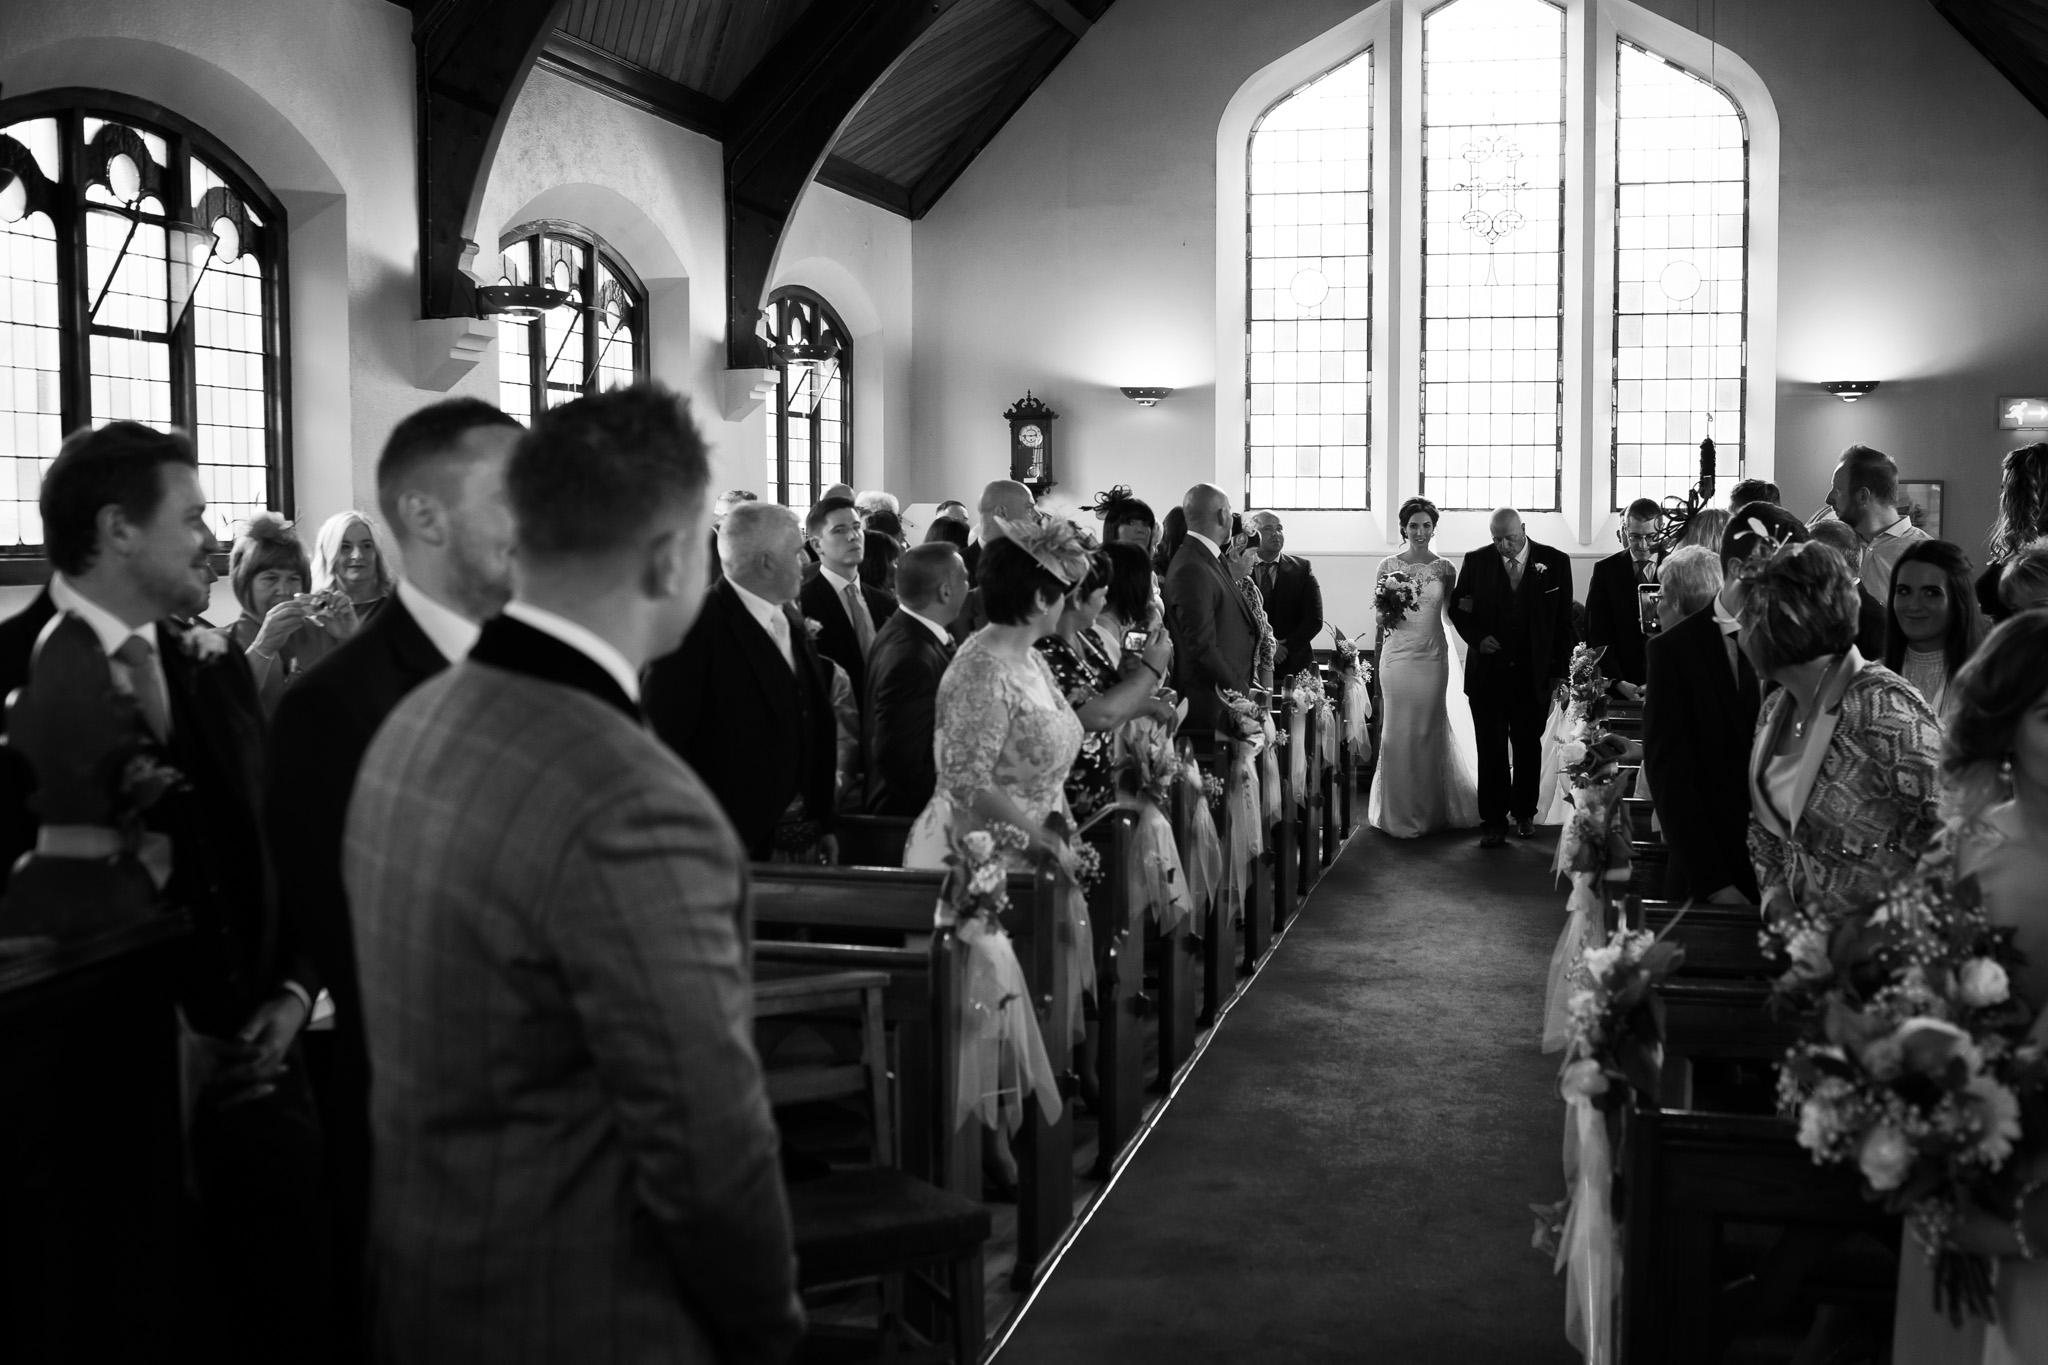 Mark_Barnes_Northern_Ireland_Wedding_Photography_Leighinmohr-house-hotel-ballymena_Wedding_Photography-18.jpg